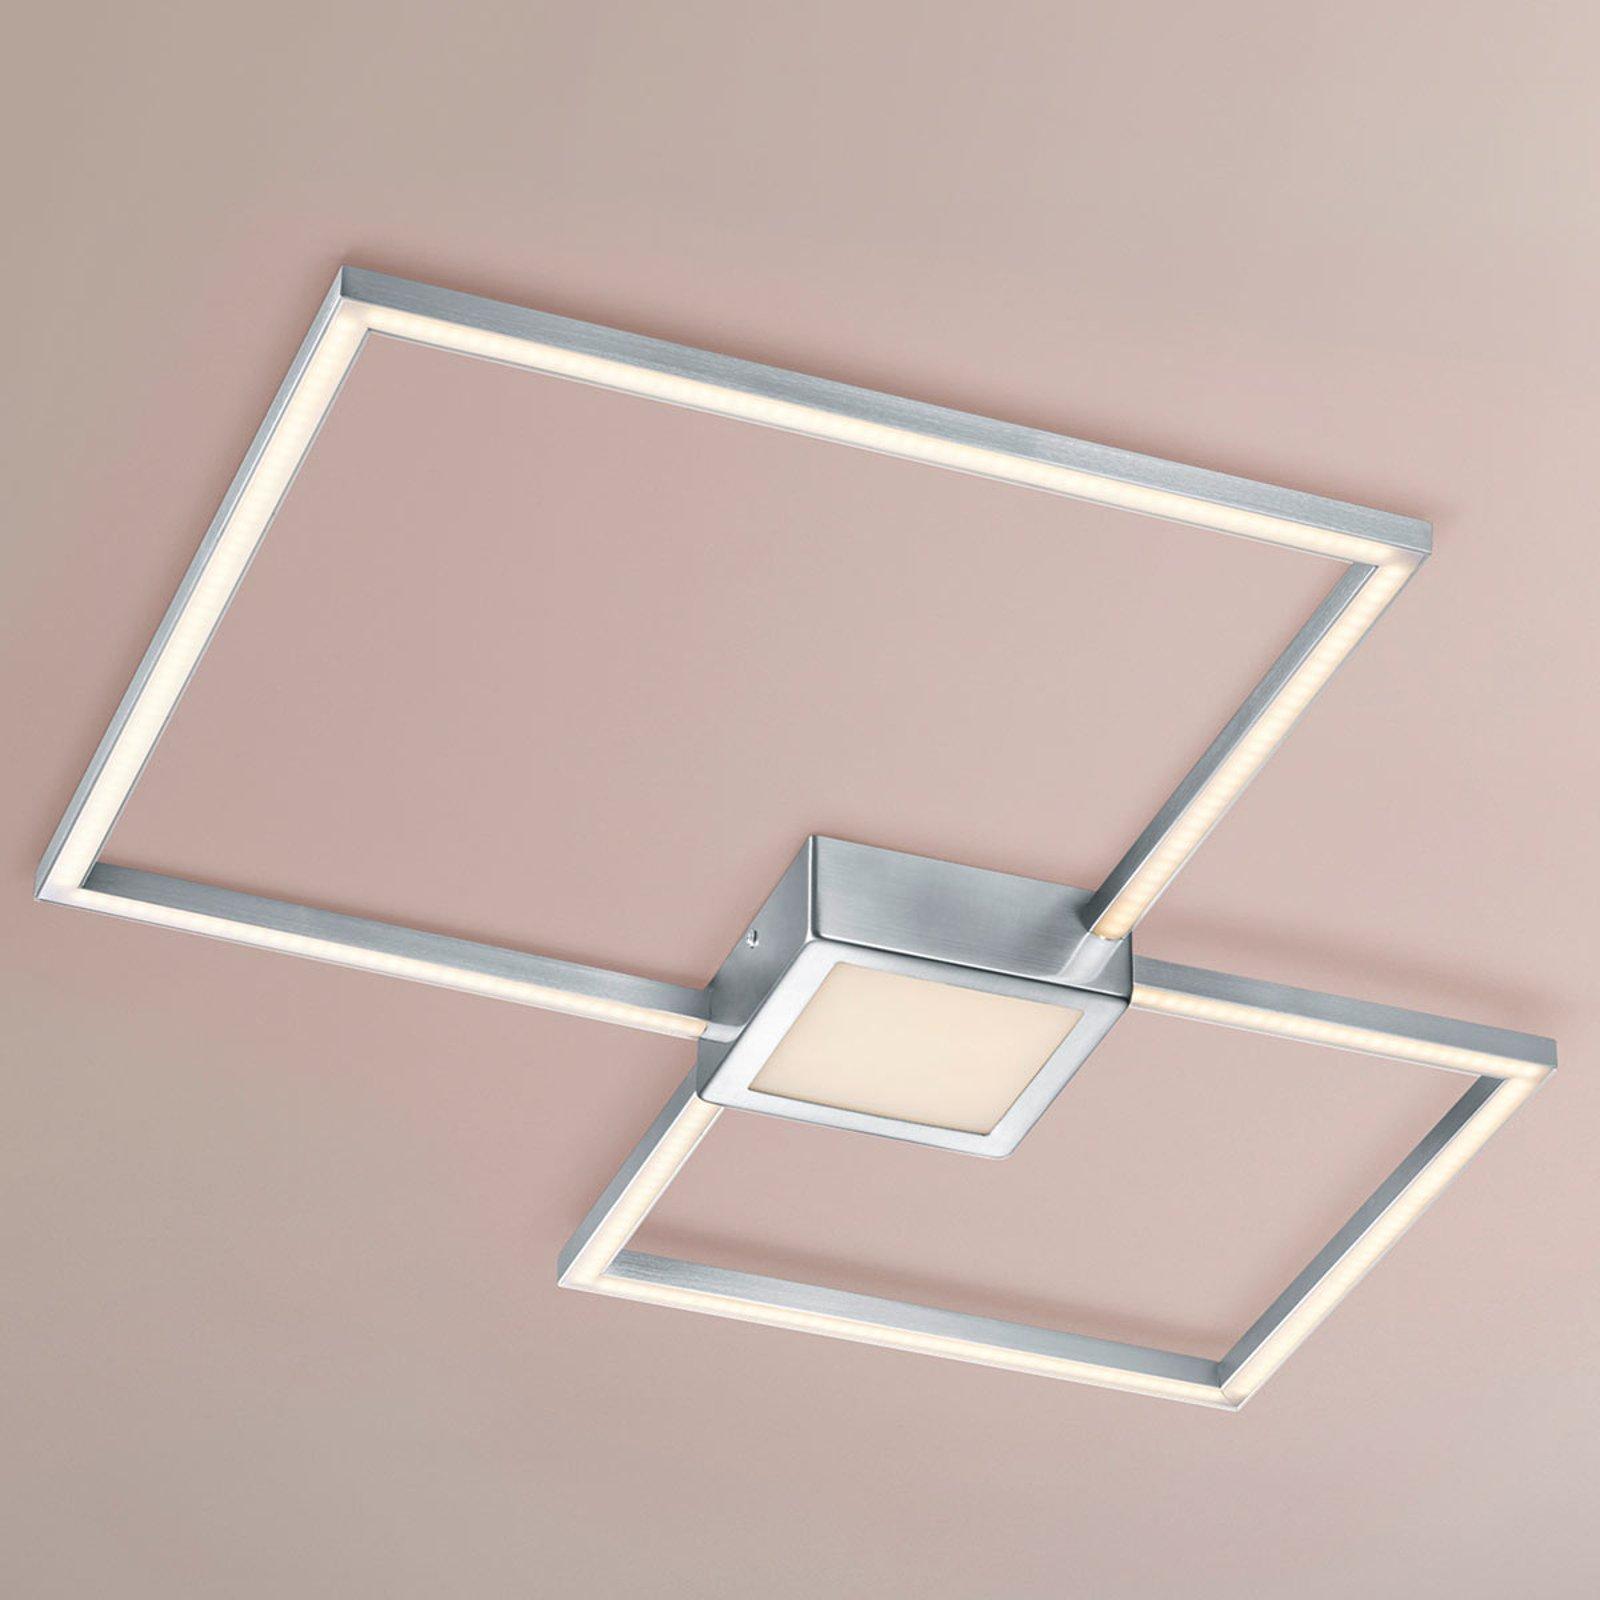 LED-taklampe Hydra – dimbar med veggbryter